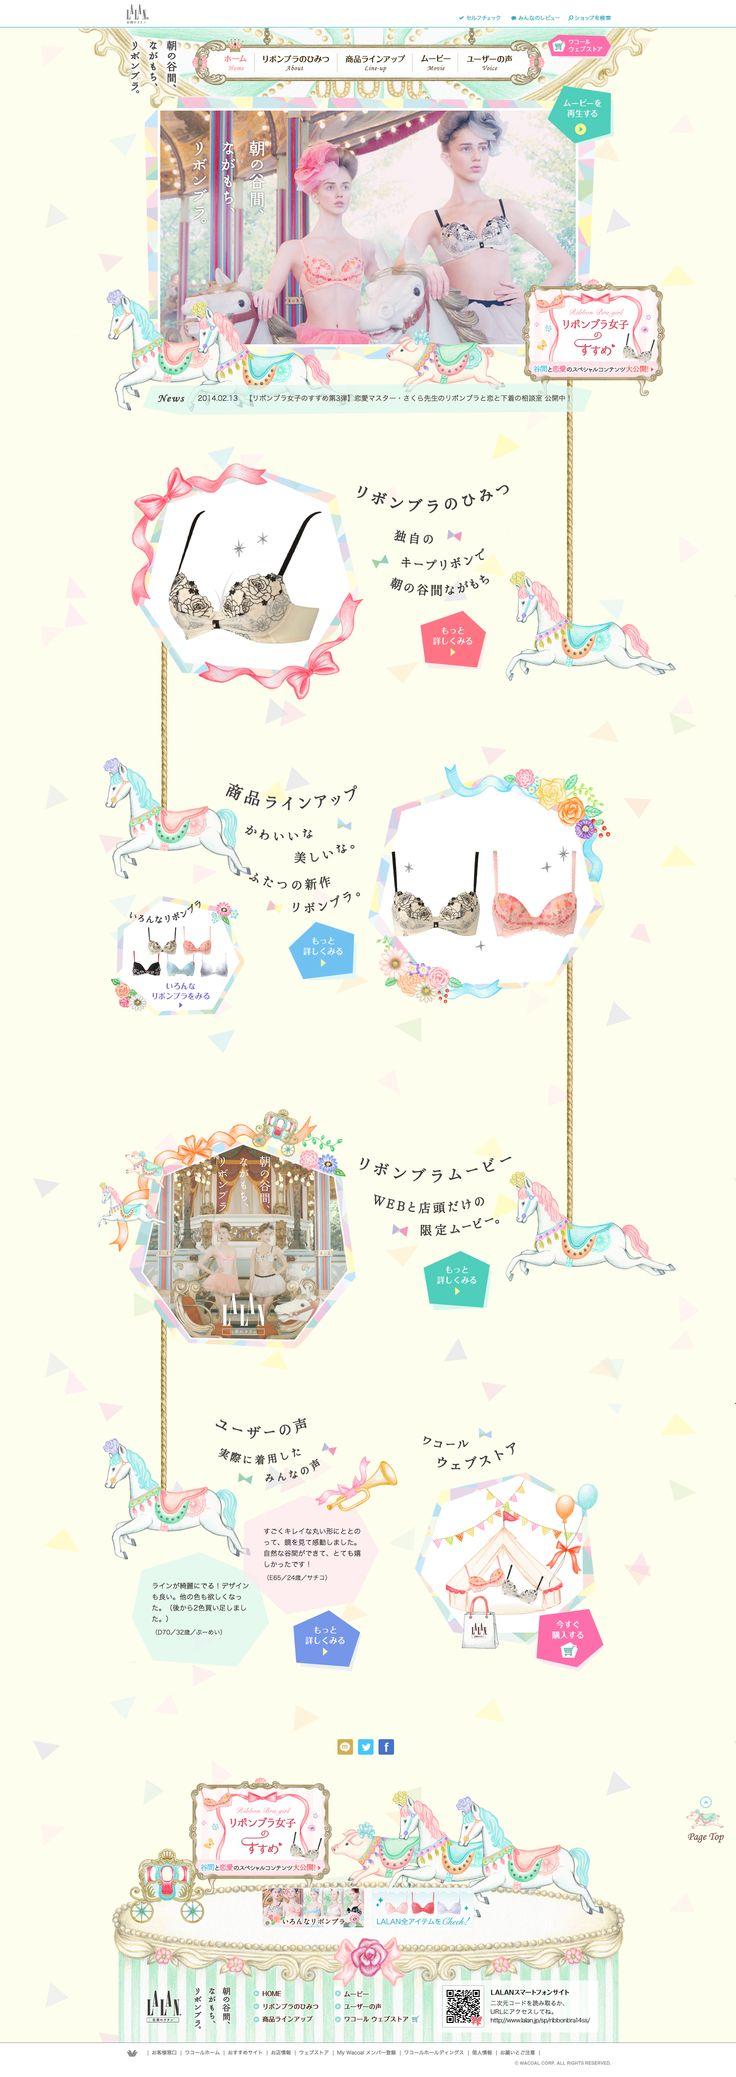 http://www.lalan.jp/ribbonbra14ss/